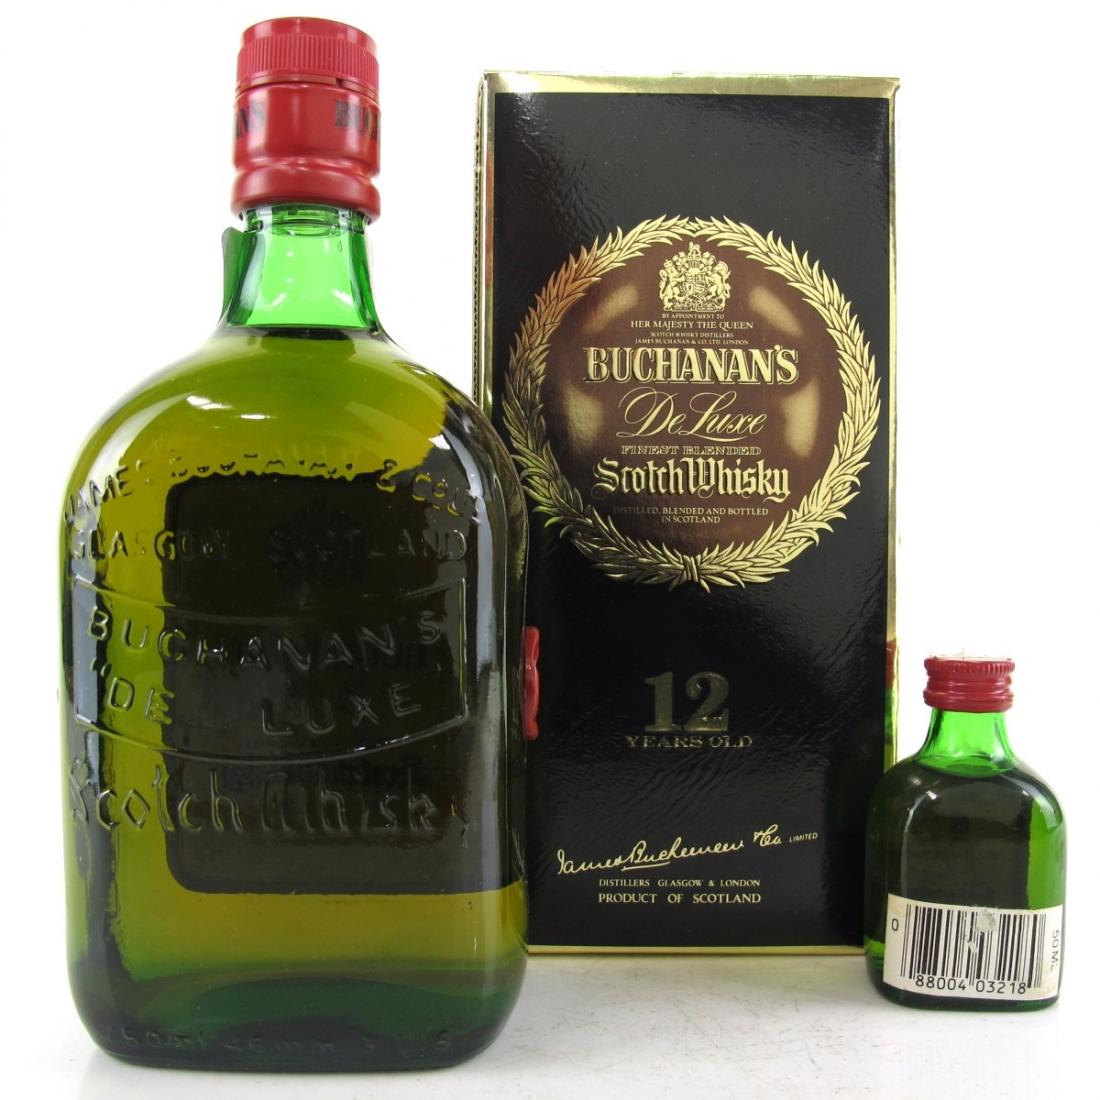 Buchanan's 12 Year Old De Luxe 1980s / with Miniature 5cl